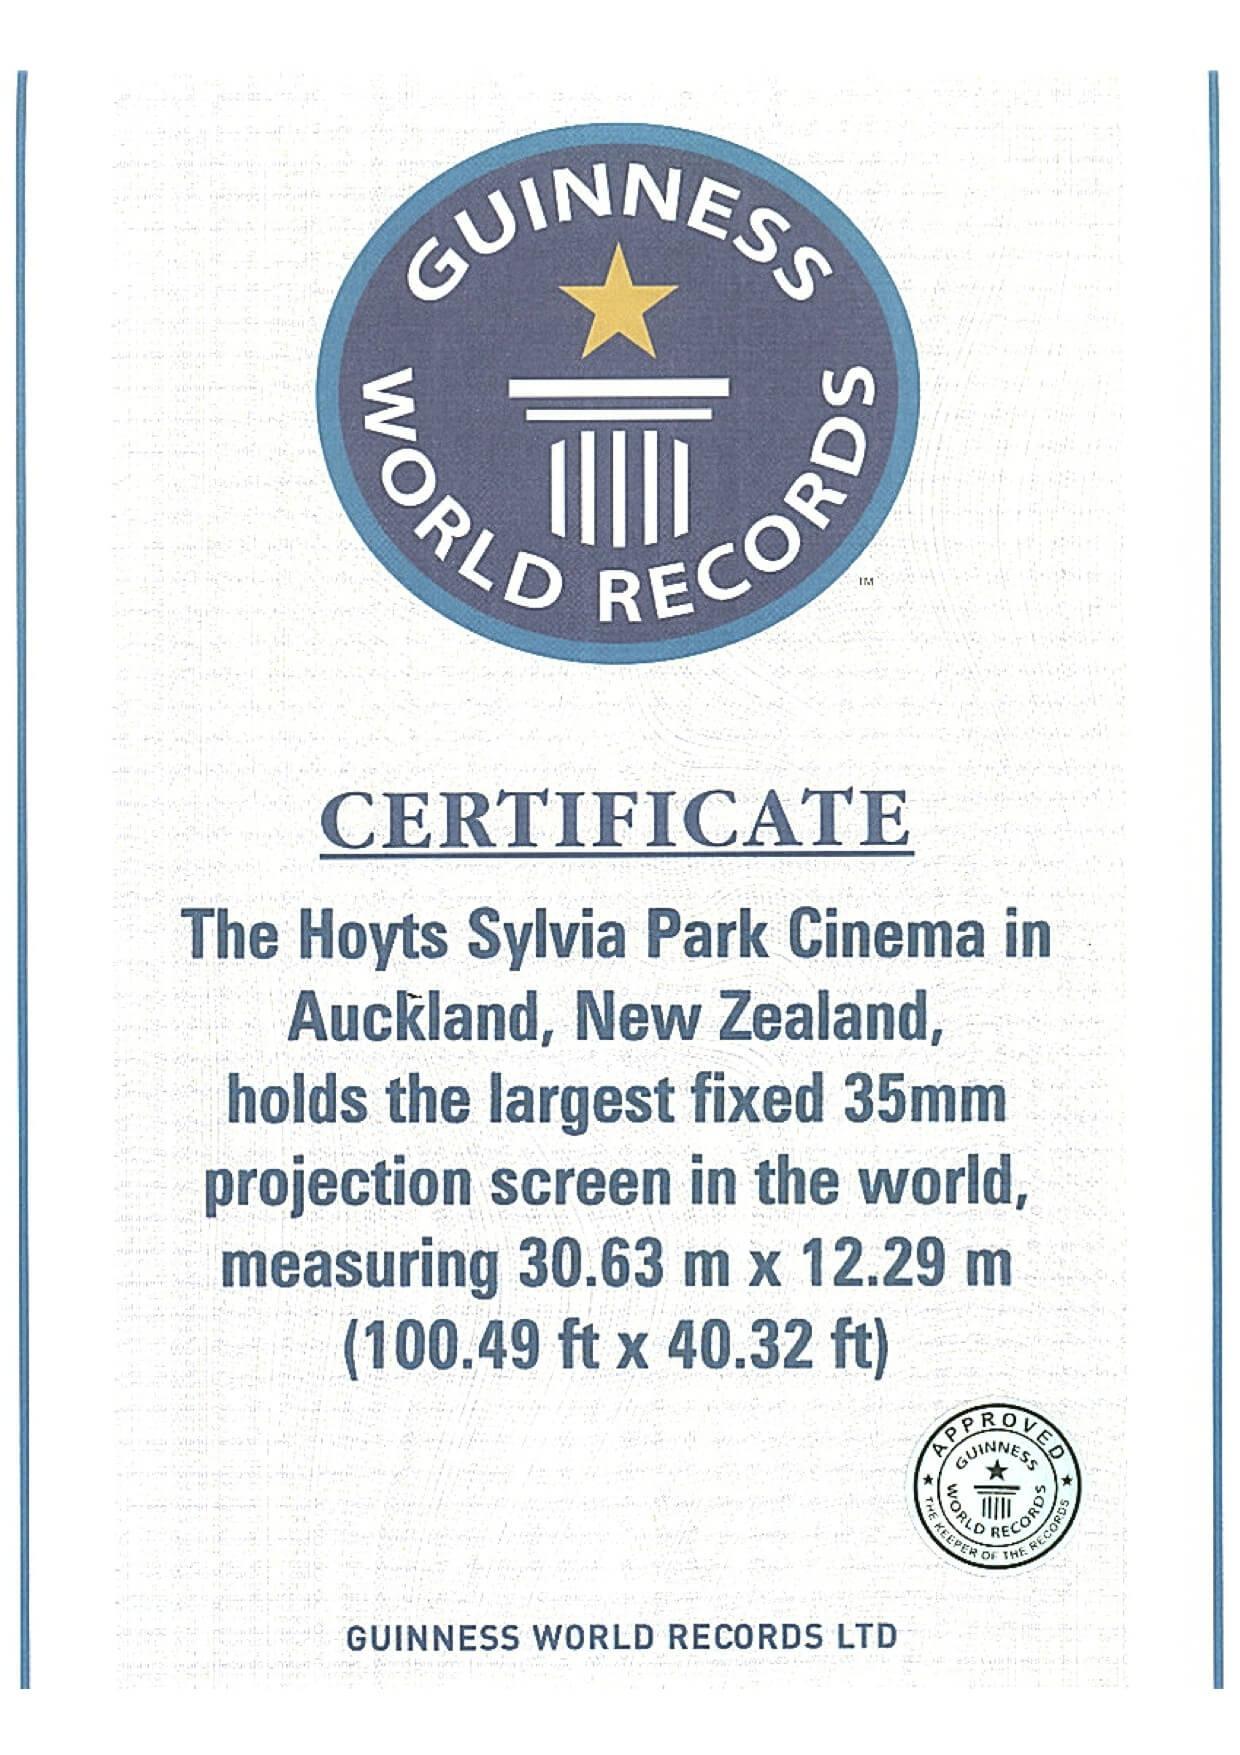 Guinness Certificate – Specialty Cinema Regarding Guinness World Record Certificate Template